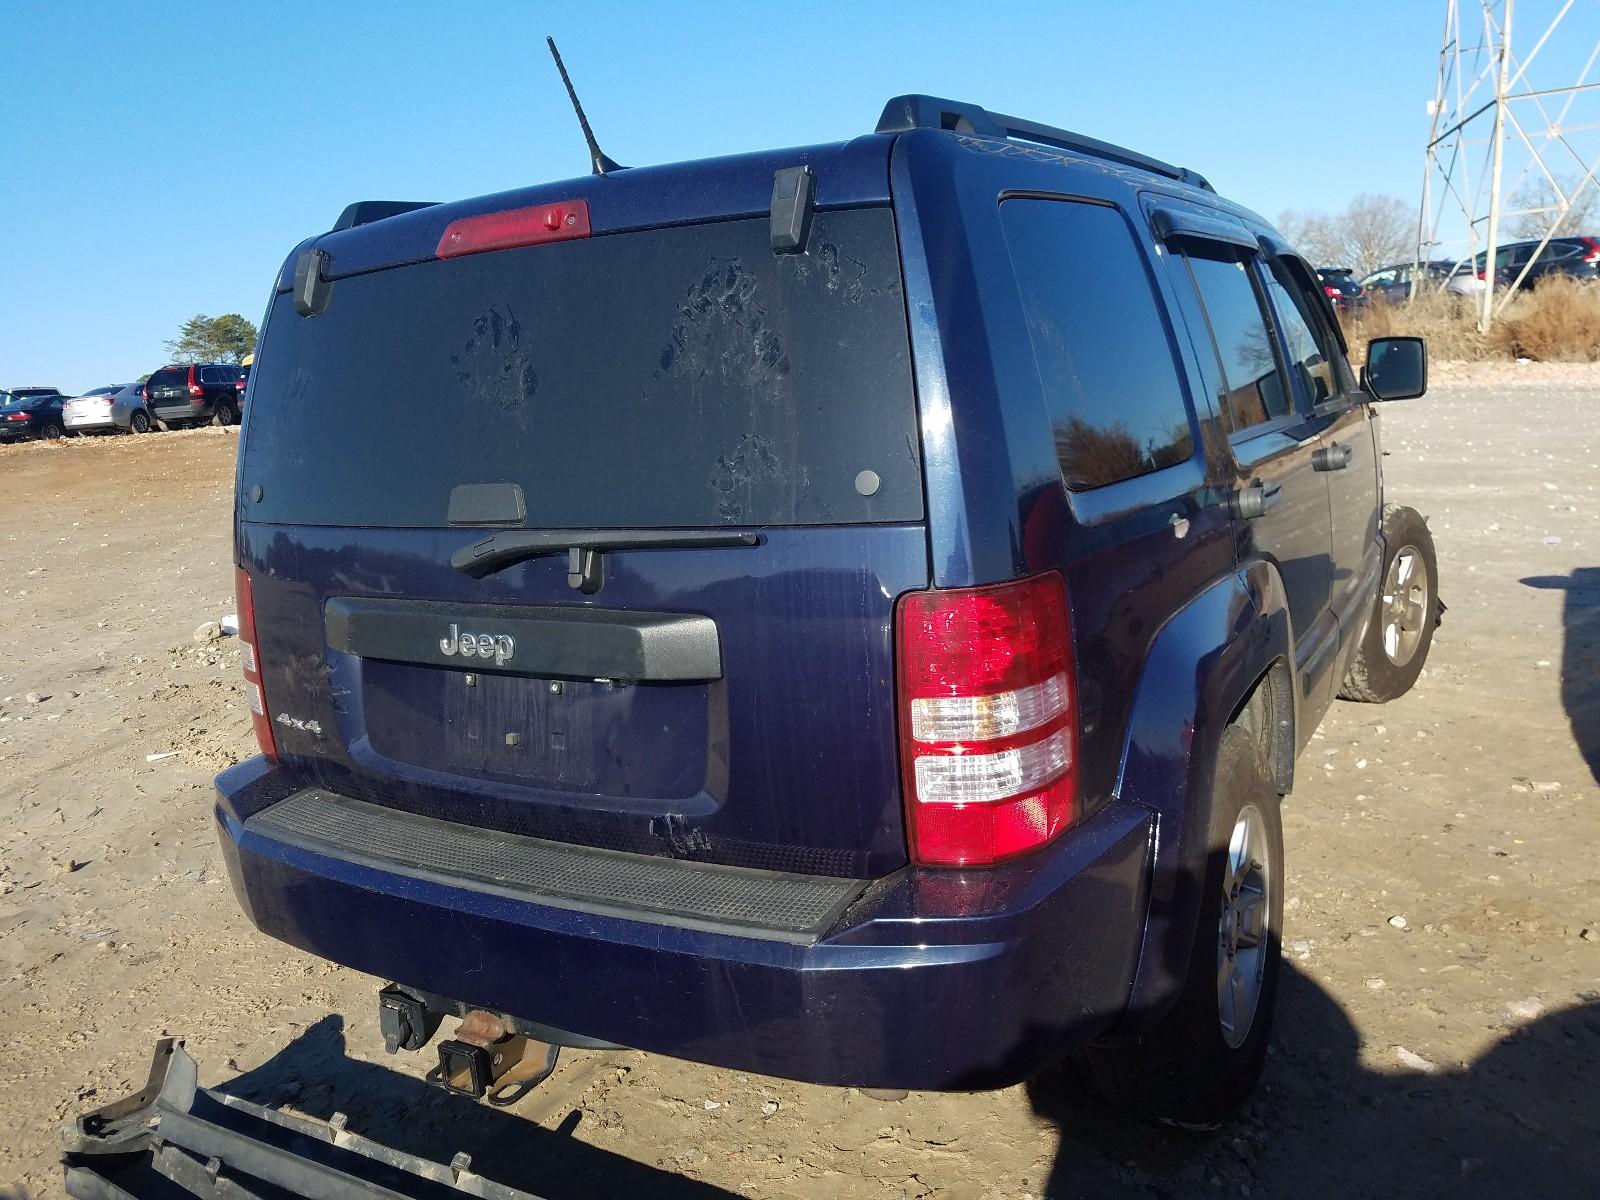 1C4PJMAK1CW154267 - 2012 Jeep Liberty Sp 3.7L rear view